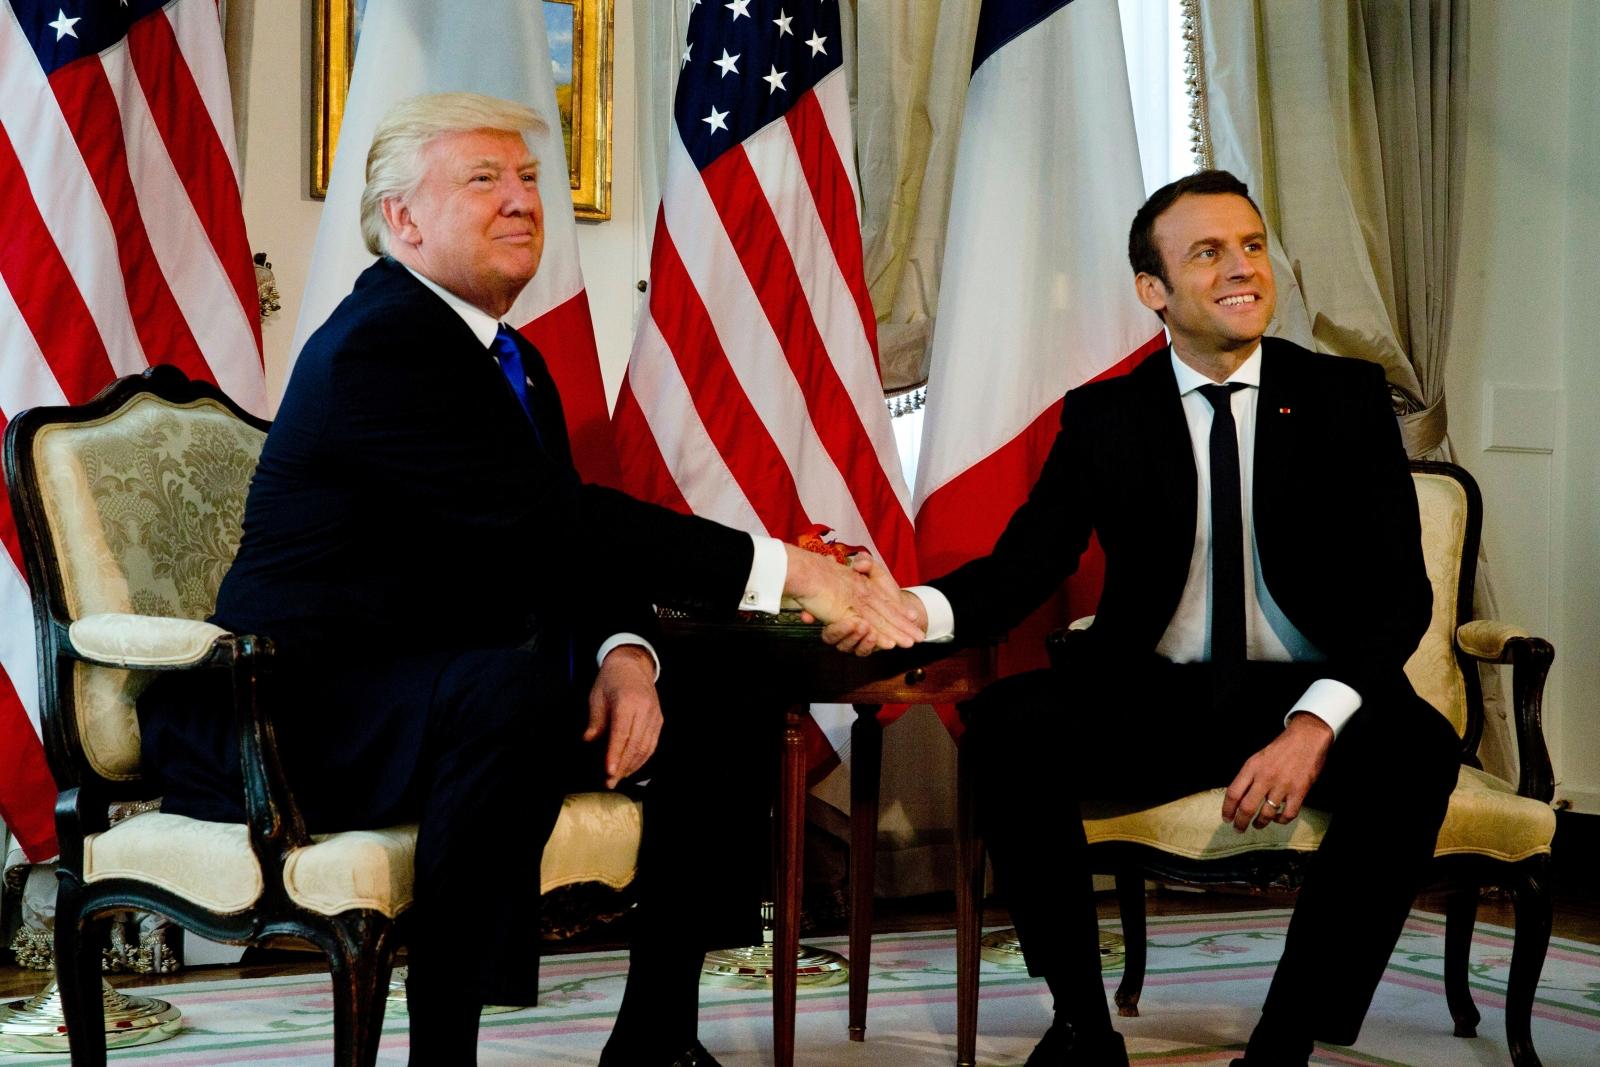 donald-trump-finally-meets-his-hand-shake-match-in-emmanuel-macron